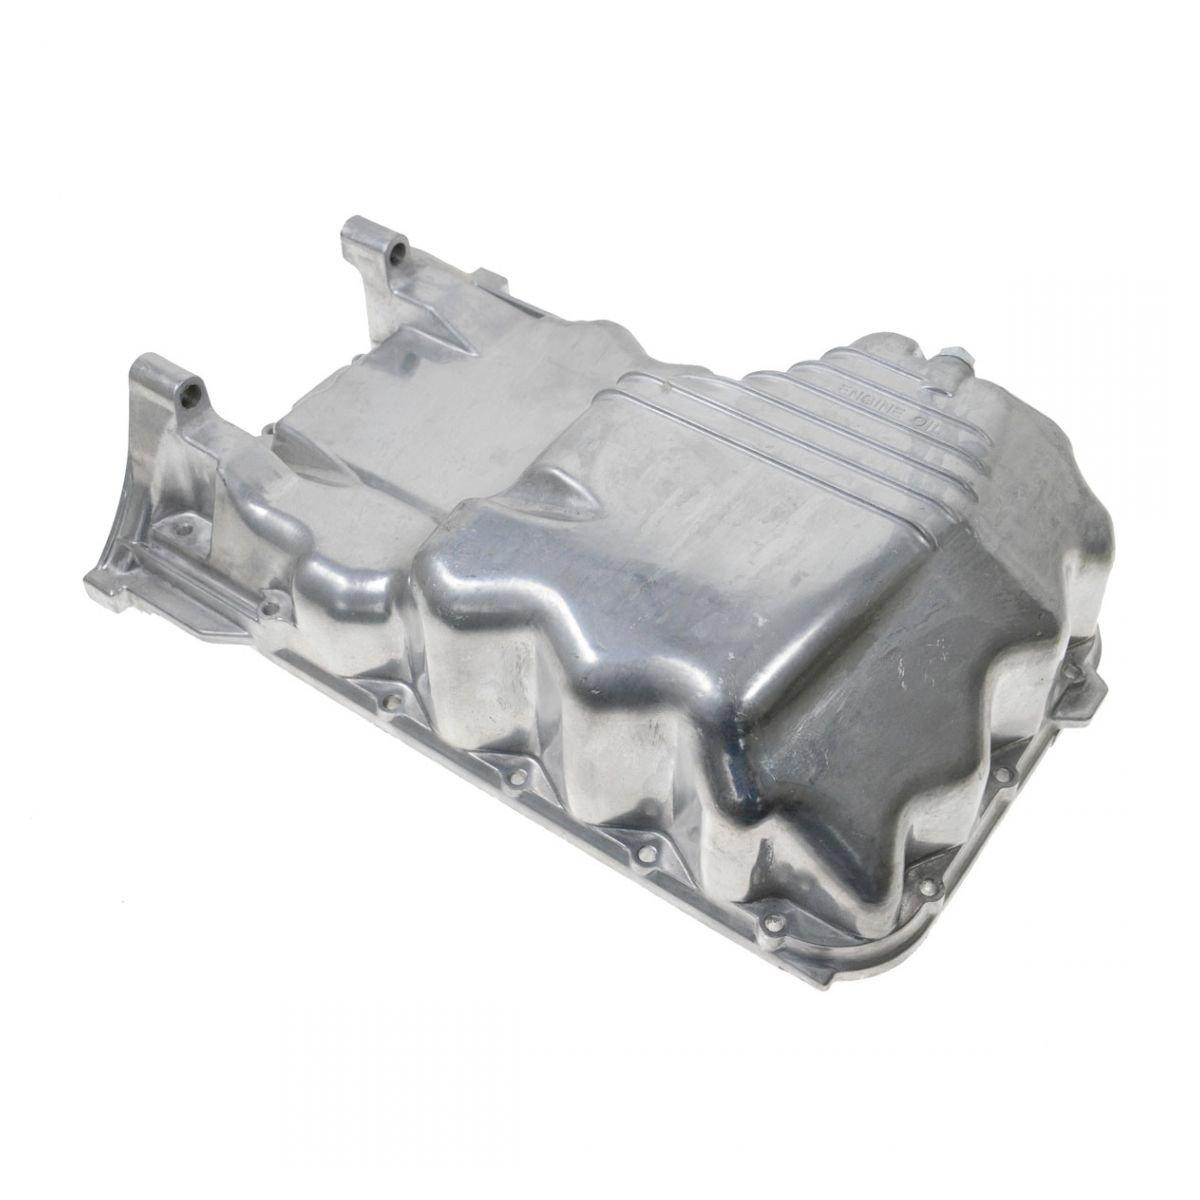 Amazon.com: Aluminum Engine Oil Pan 11200P8AA00 for Acura CL TL Honda  Accord Odyssey Van: Automotive